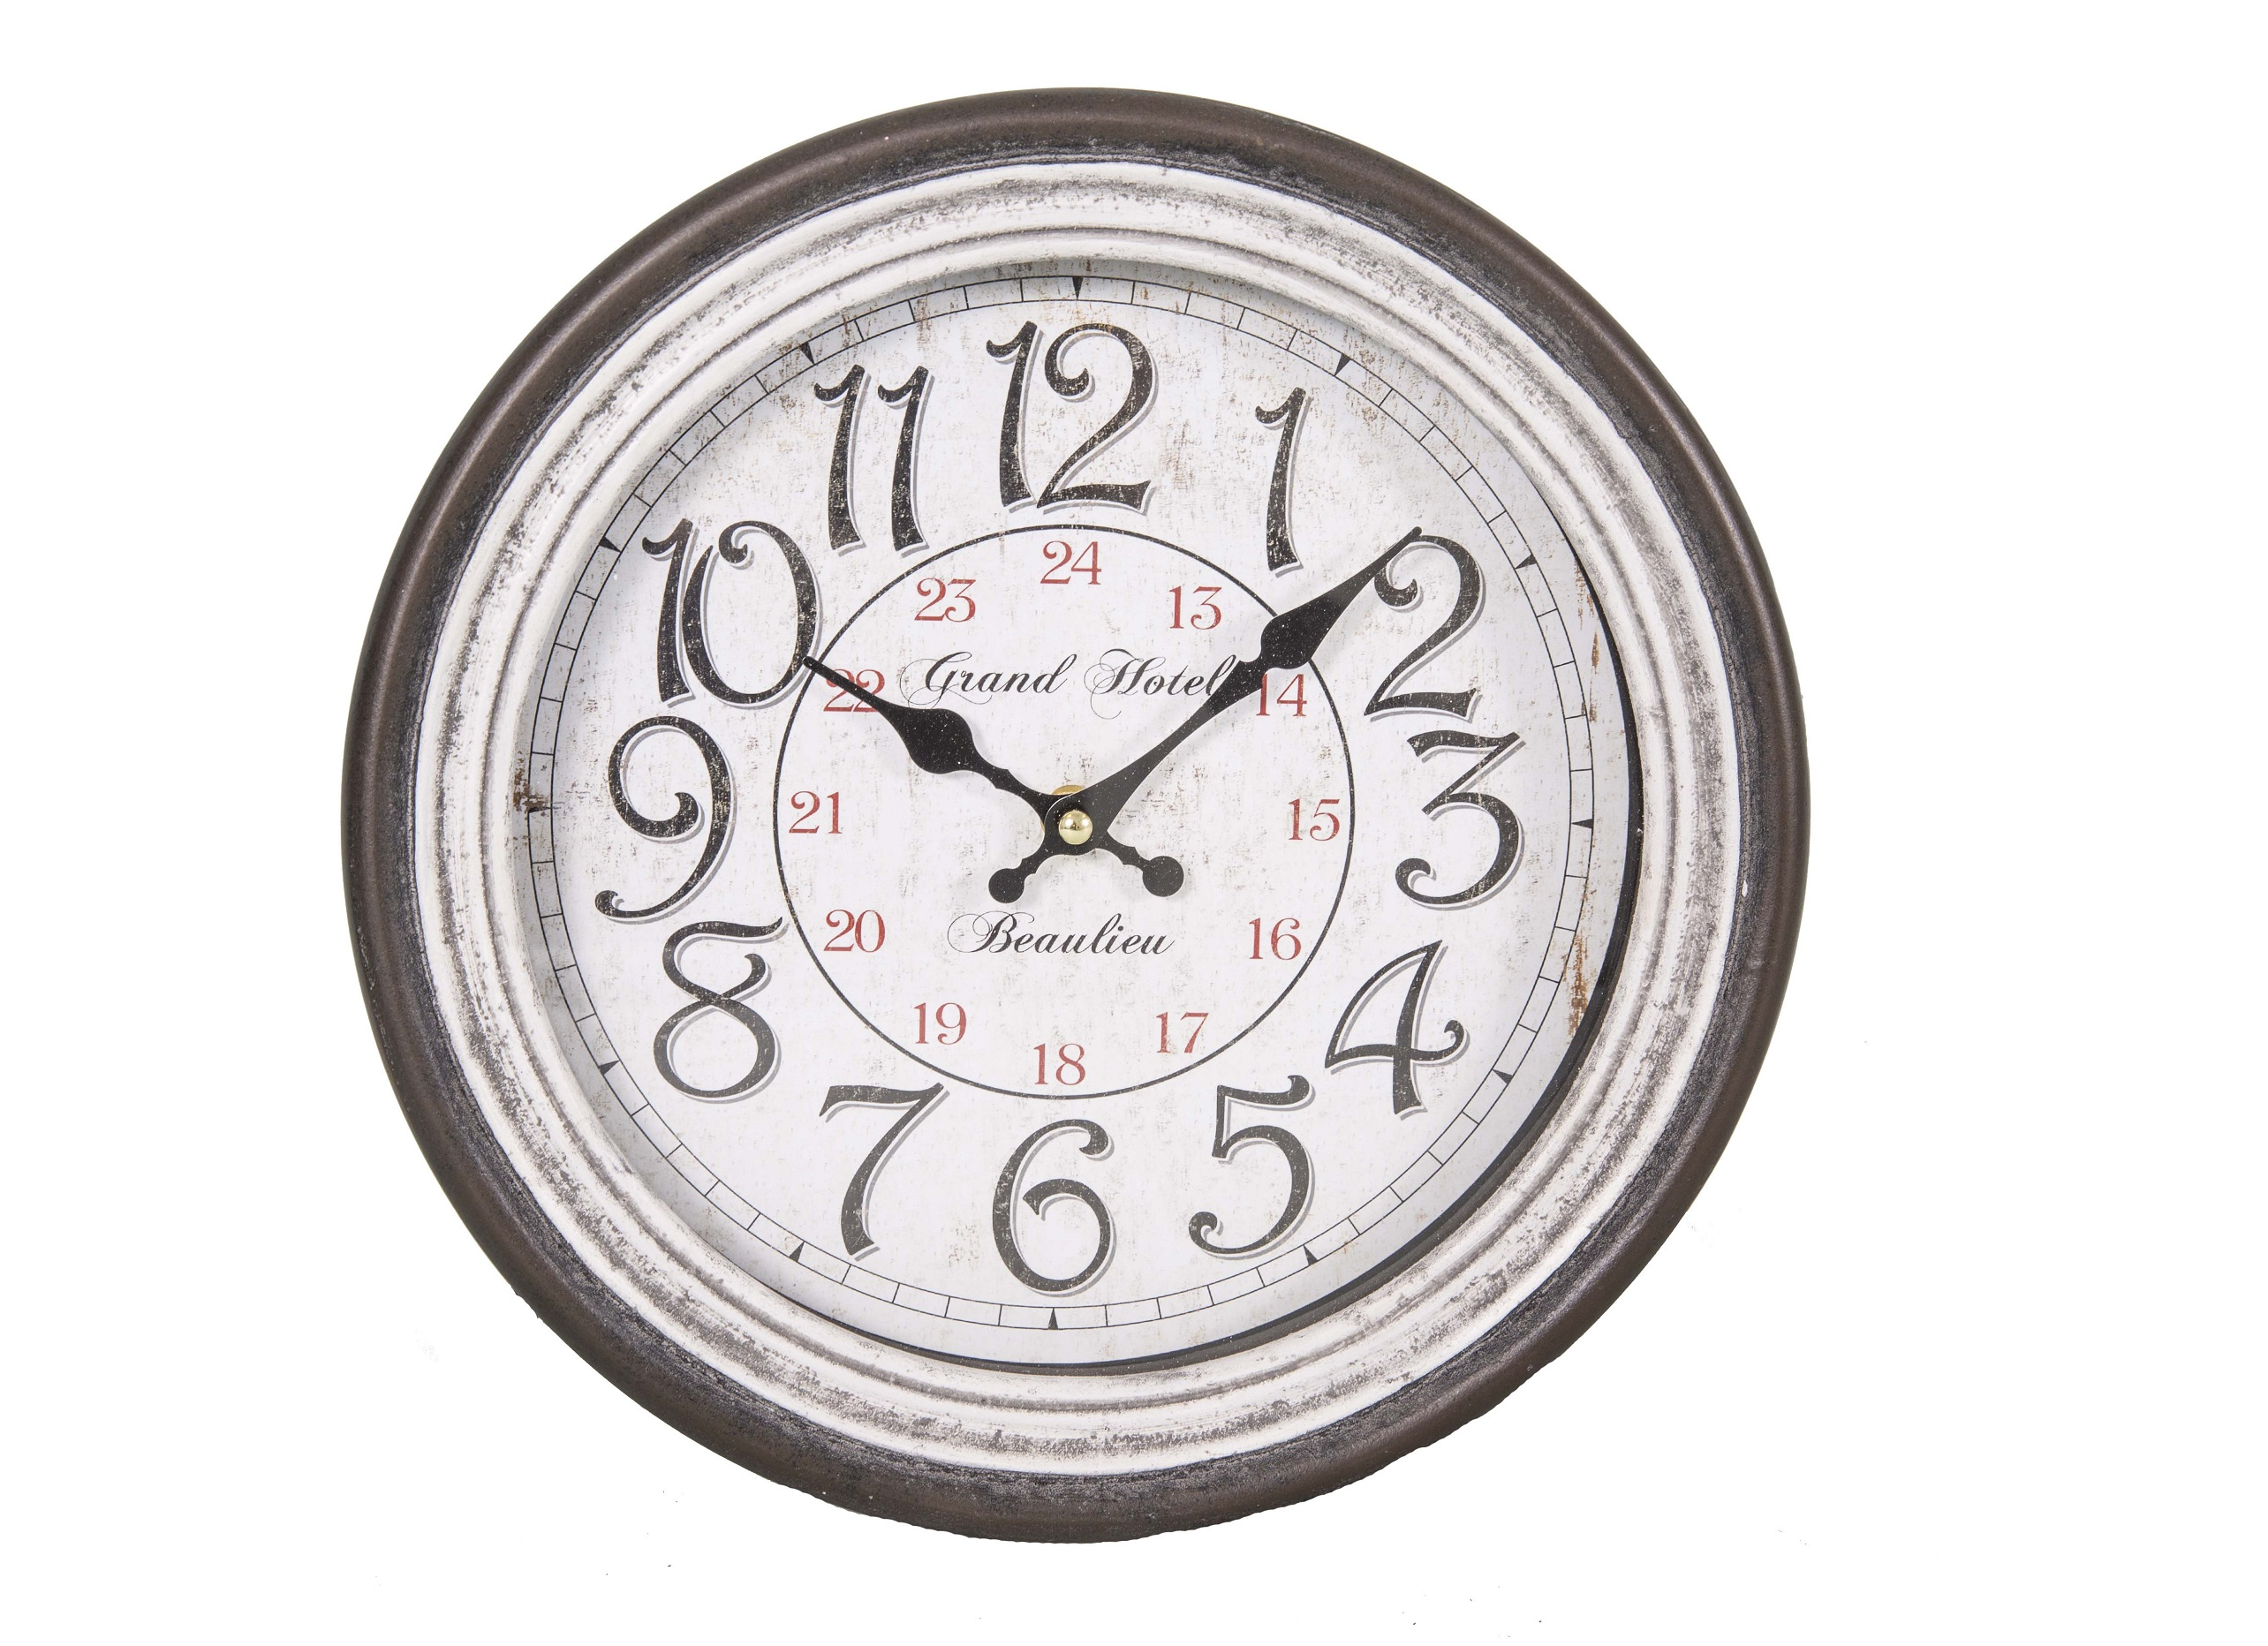 Настенные часы BeaulieuНастенные часы<br>&amp;lt;div&amp;gt;Механизм: кварцевый&amp;lt;/div&amp;gt;&amp;lt;div&amp;gt;Материал: МДФ, бумага, стекло&amp;lt;/div&amp;gt;<br><br>Material: Бумага<br>Length см: 32<br>Width см: 32<br>Height см: 67.65